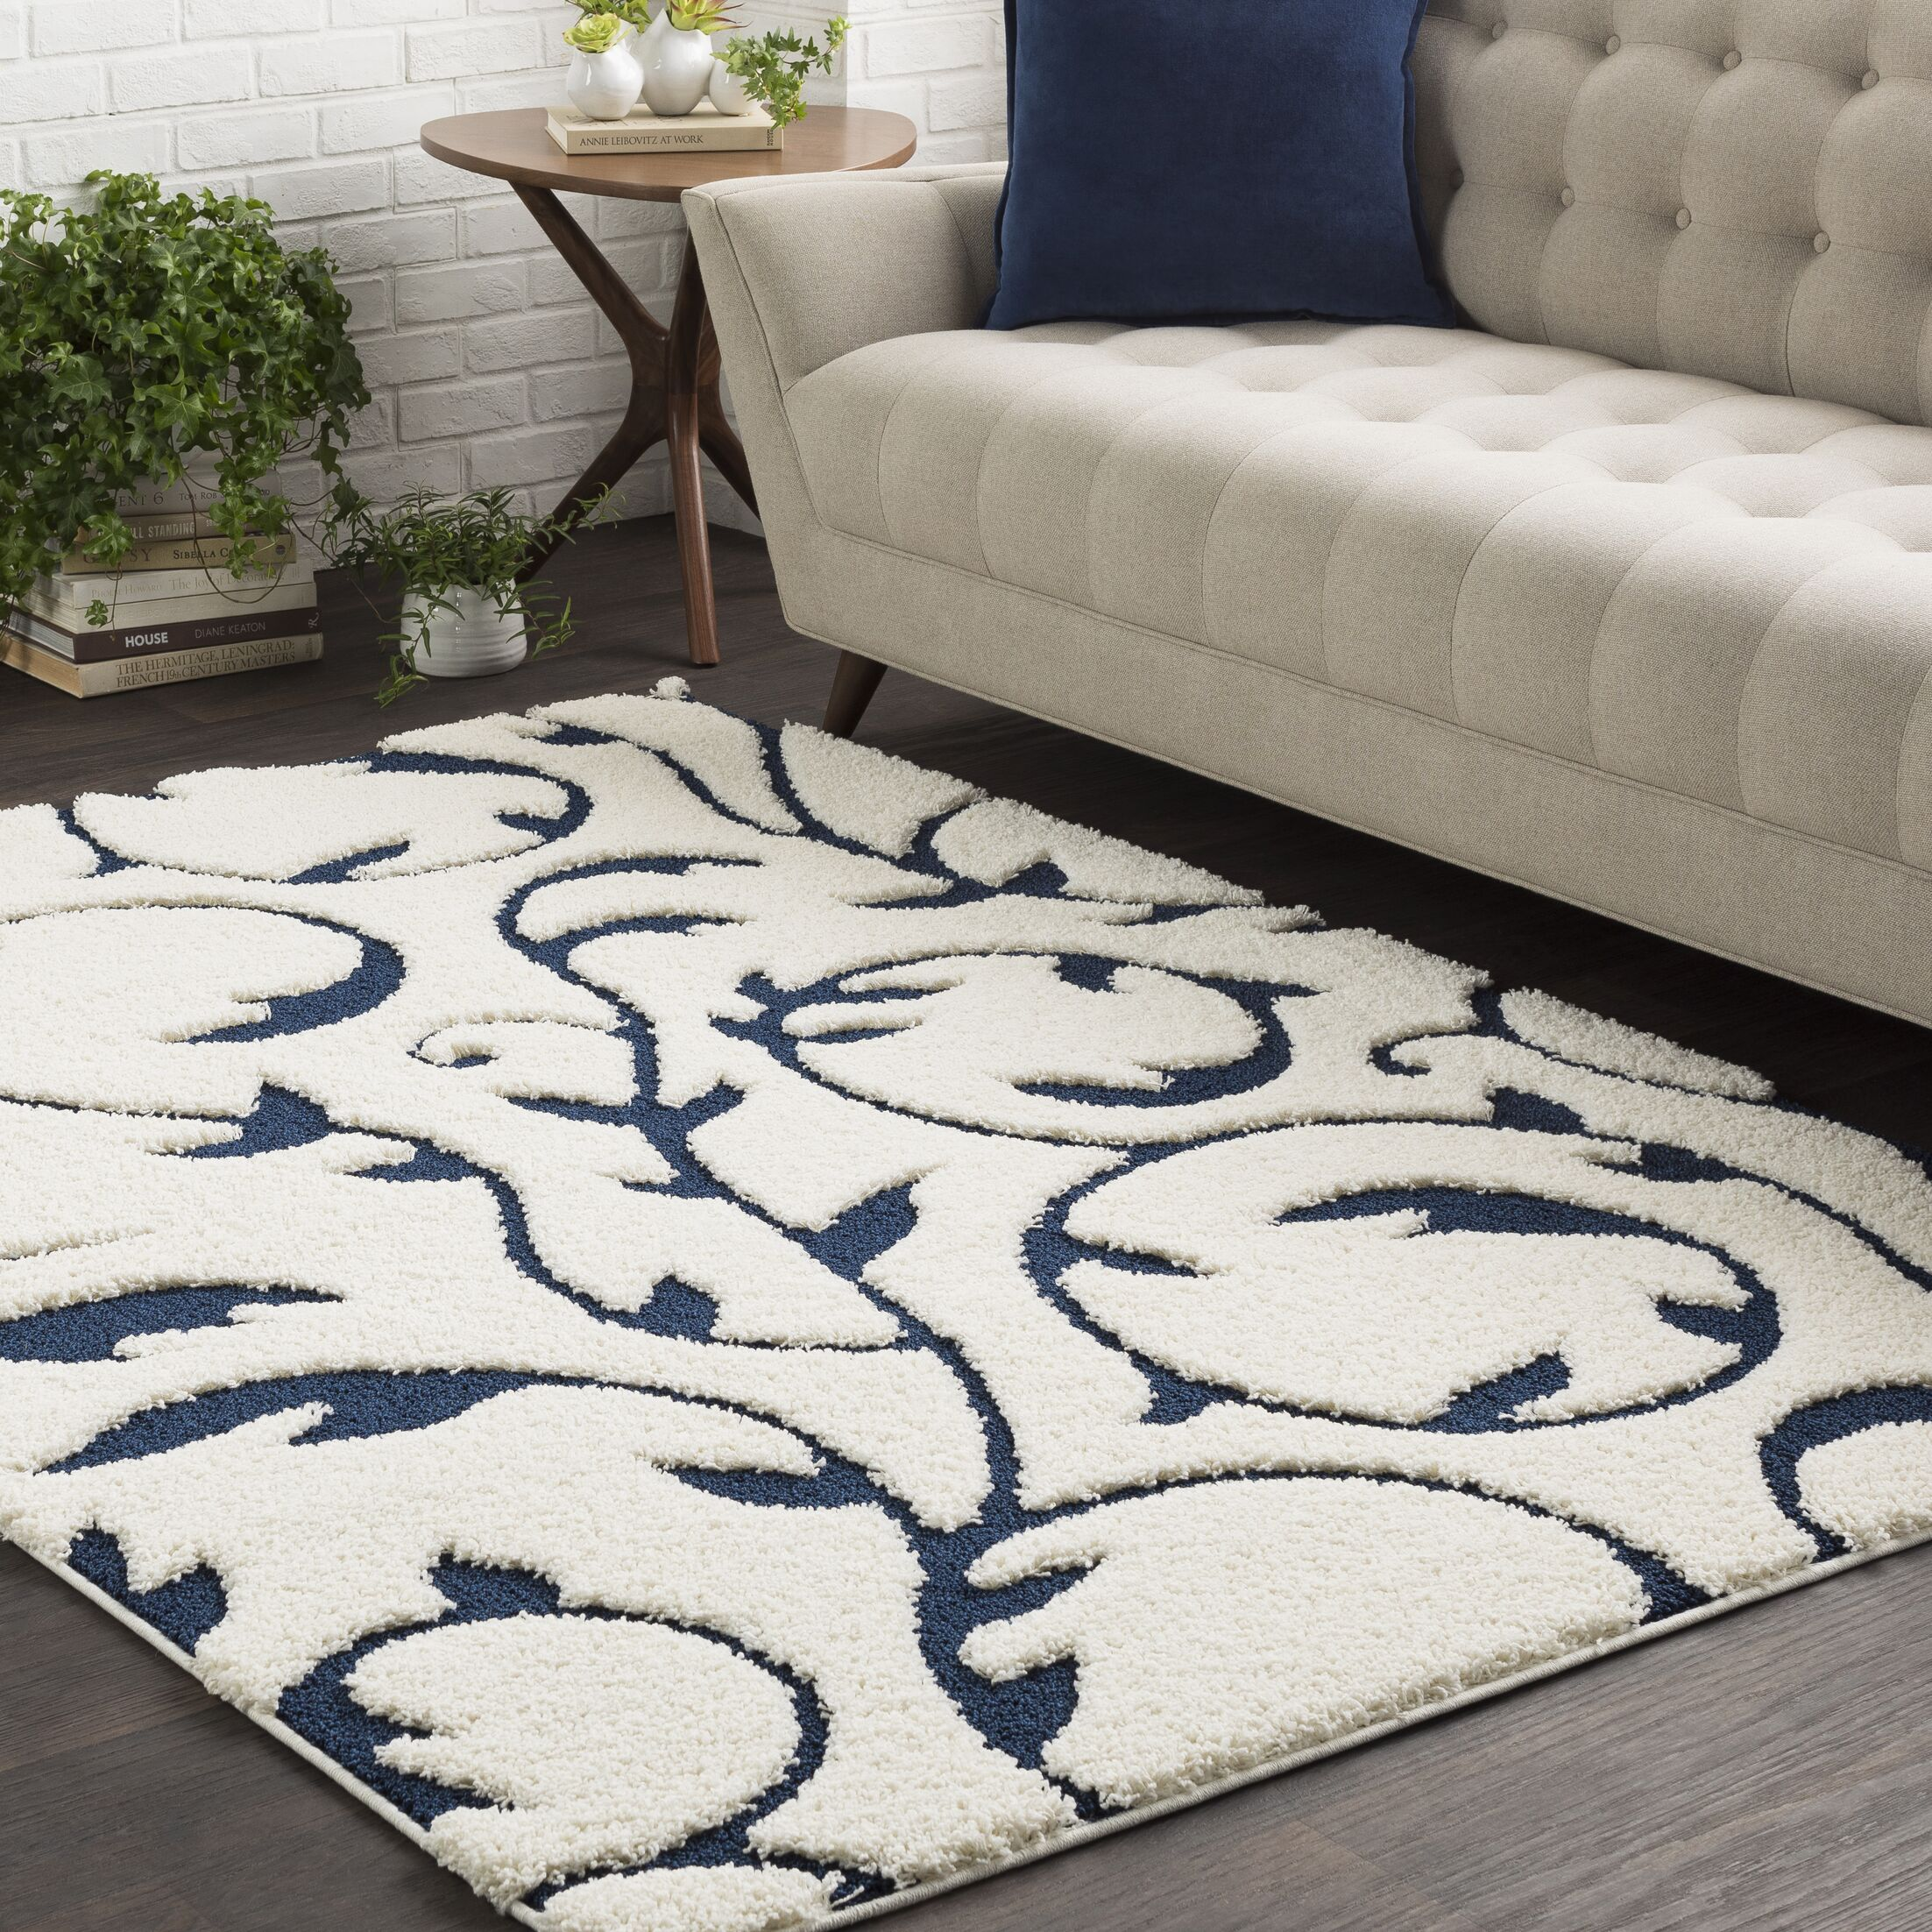 Murdock Soft Floral Shag Blue/White Area Rug Rug Size: Rectangle 7'10